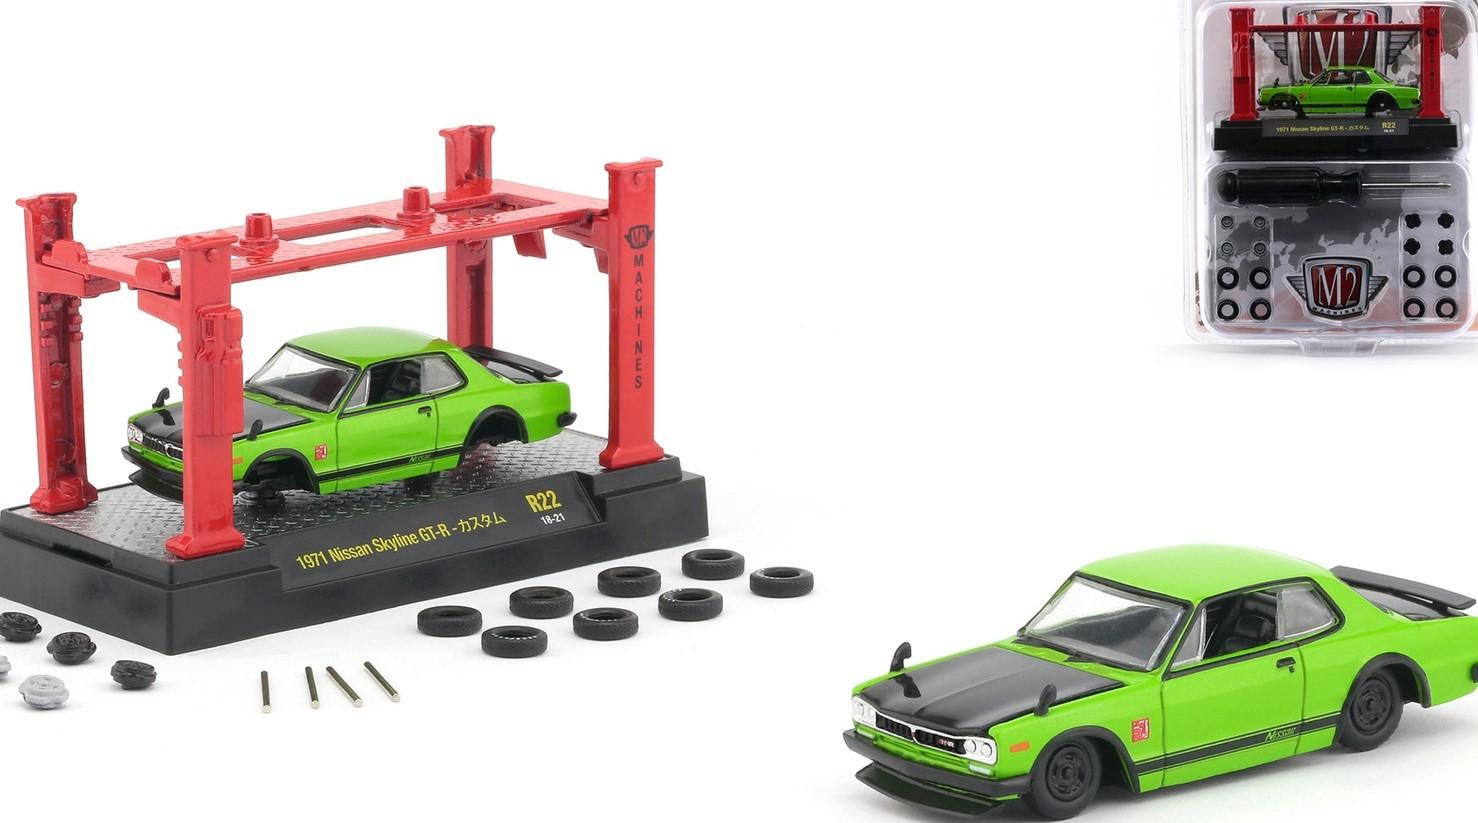 Miniatura Nissan Skyline GT-R 1971 Elevador Troca Rodas 1/64 M2